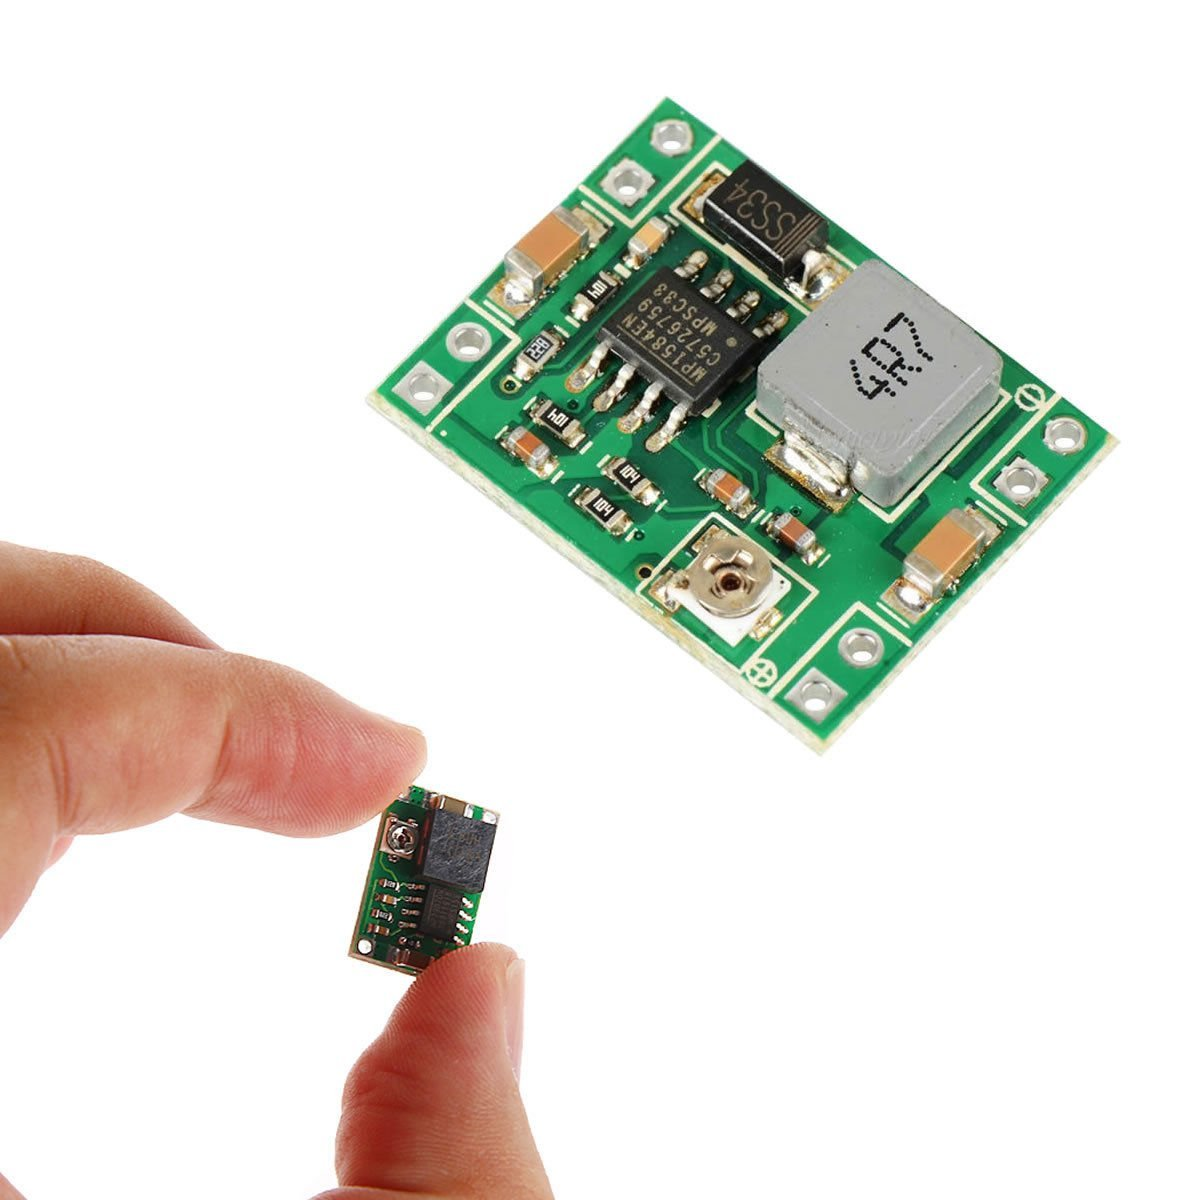 Lanmu Mp1584en Dc 3a Converter Adjustable Step Down Power Supply 5v To 12v With Lt1073 Module Replace Lm2596 24v 9v 3v Computers Accessories